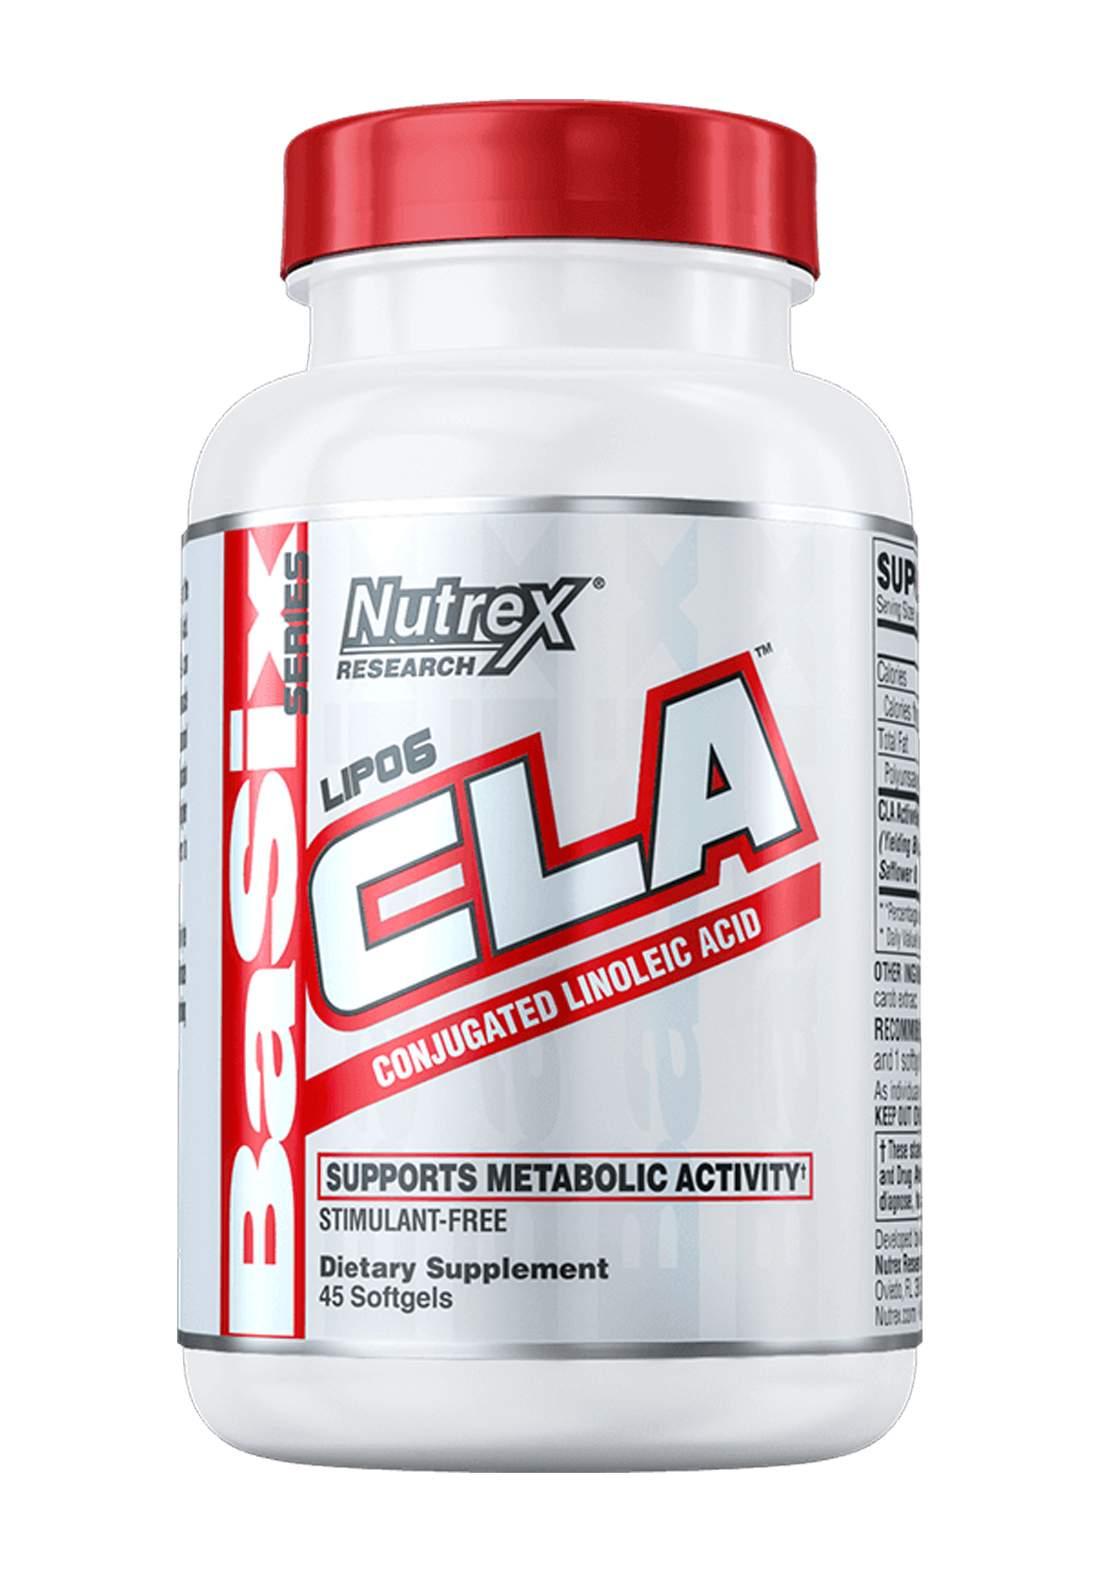 Nutrex Lipo 6  CLA Conjugated Linoleic Acid 45 Soft Gel 1000mg   مكمل غذائي لانقاص الوزن